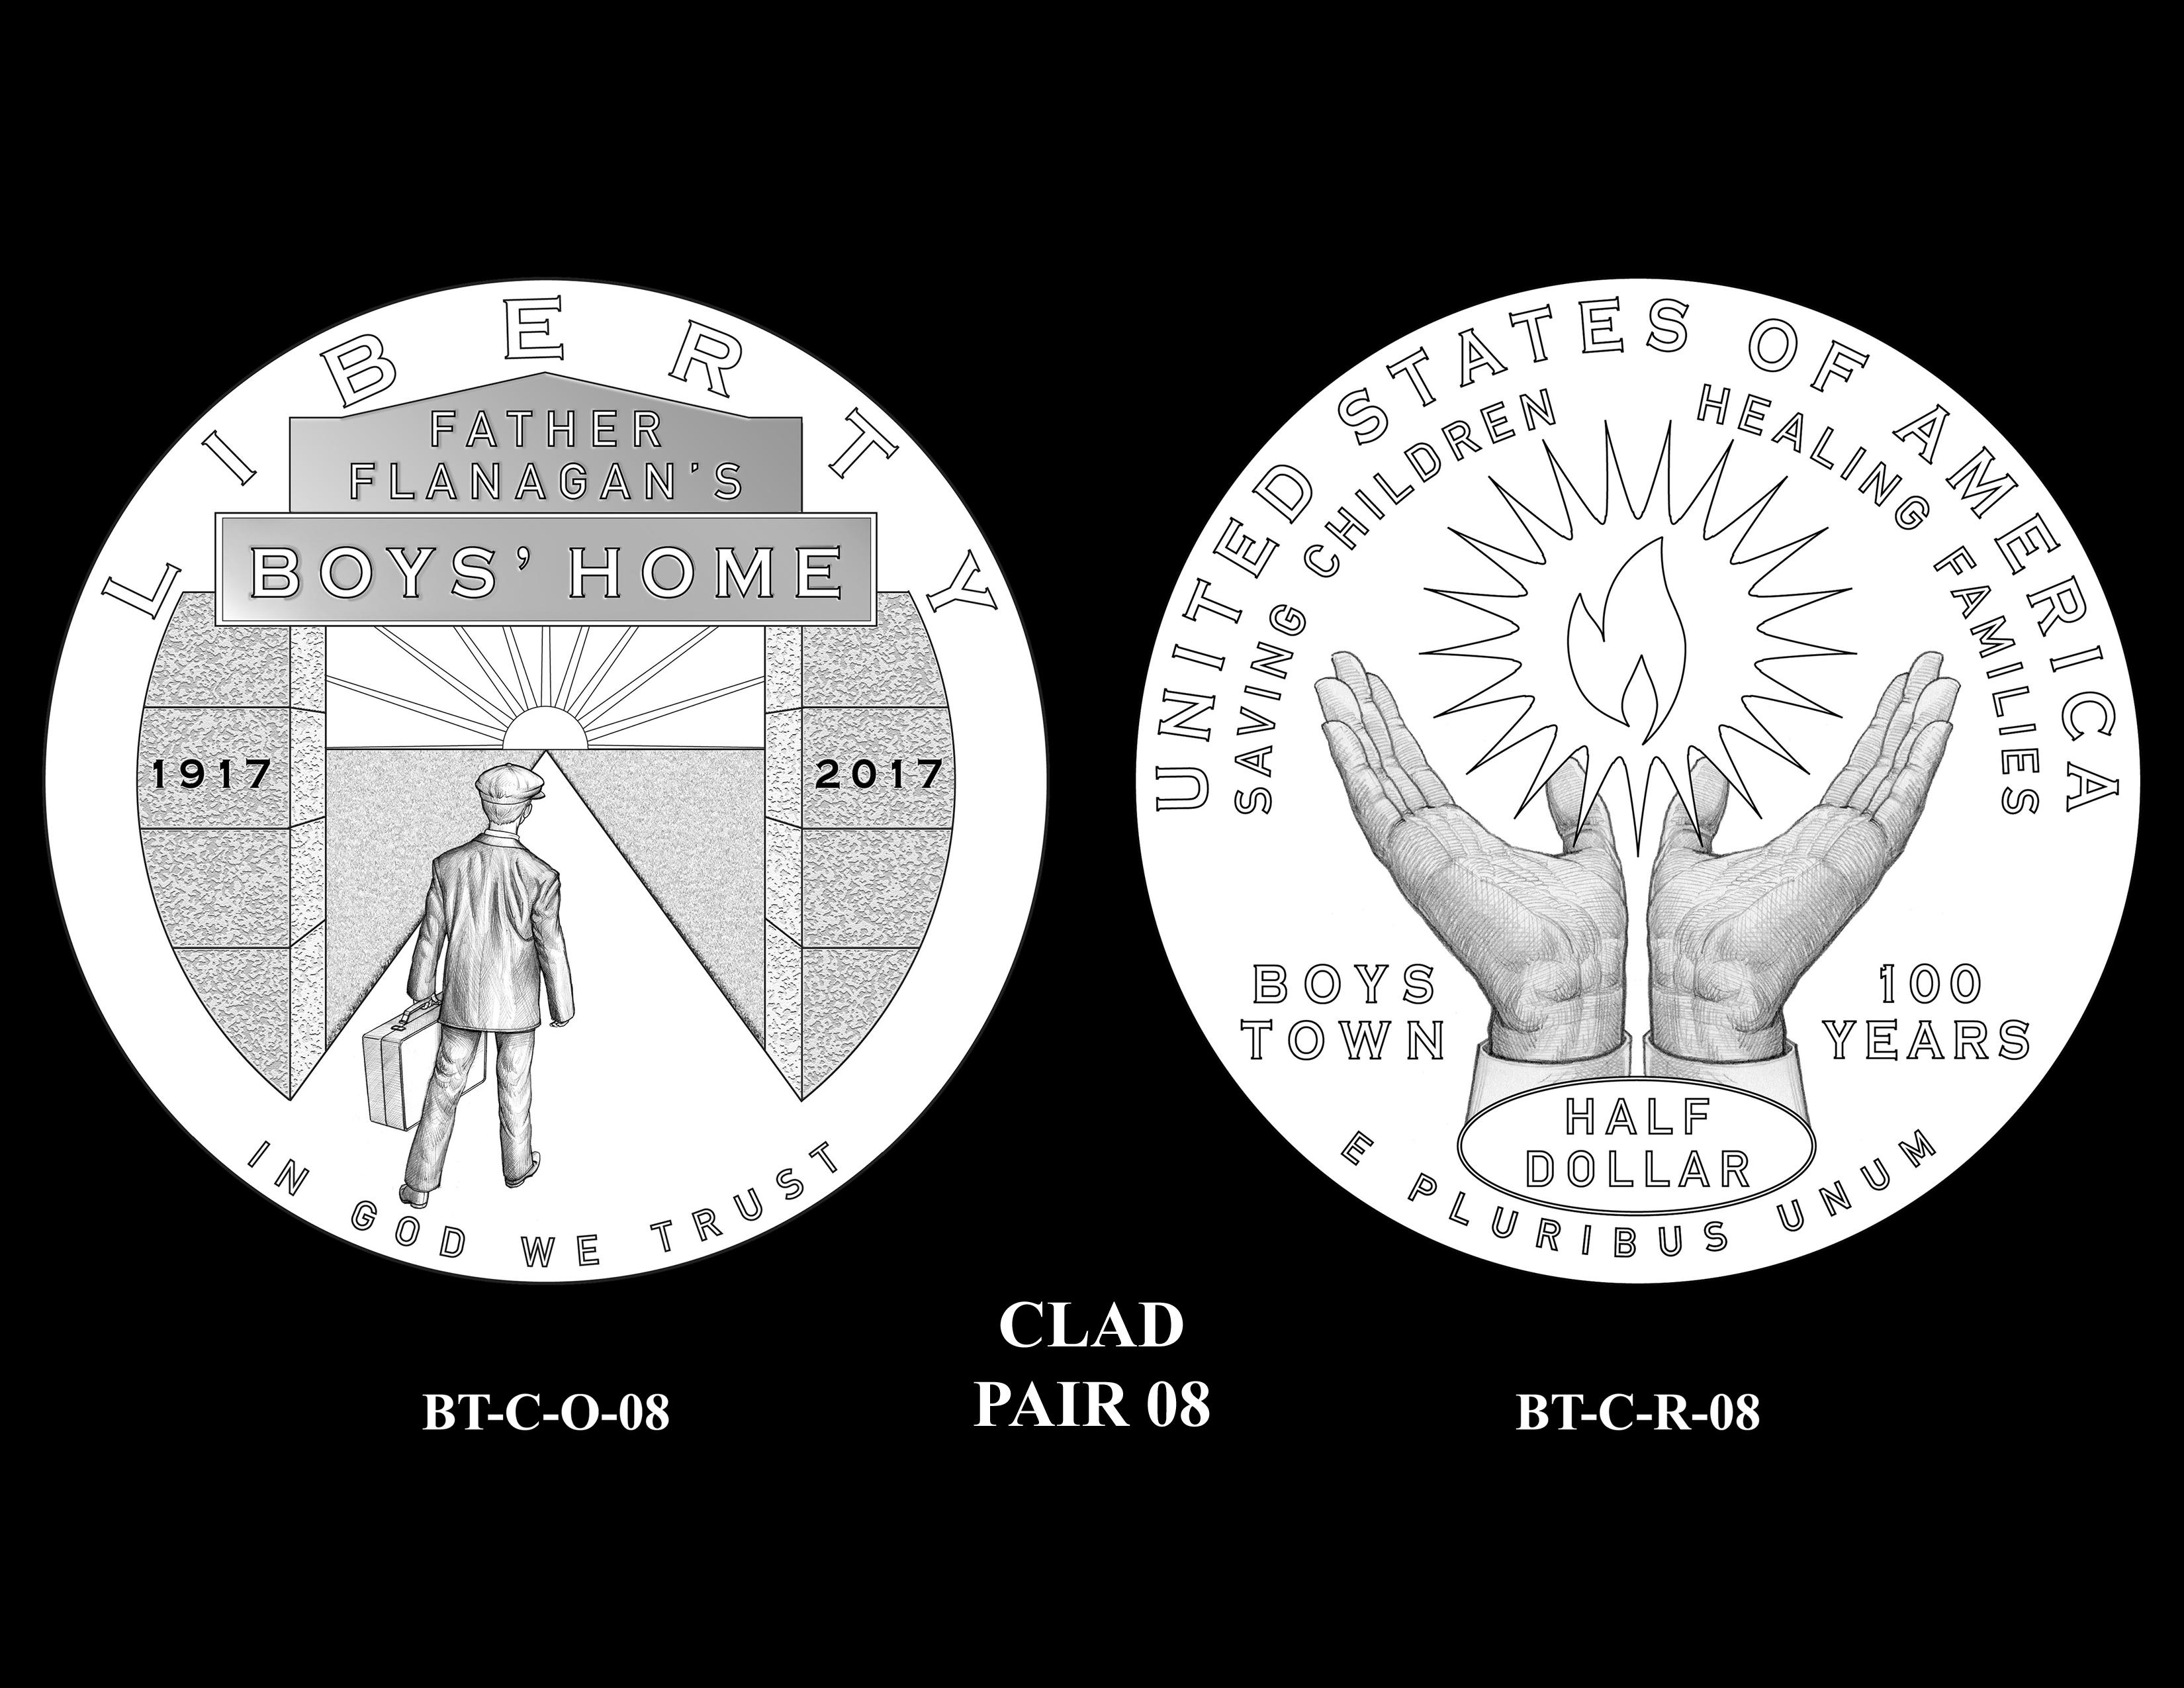 Clad-Pair-08 -- 2017 Boystown Centennial Commemorative Coin  Program